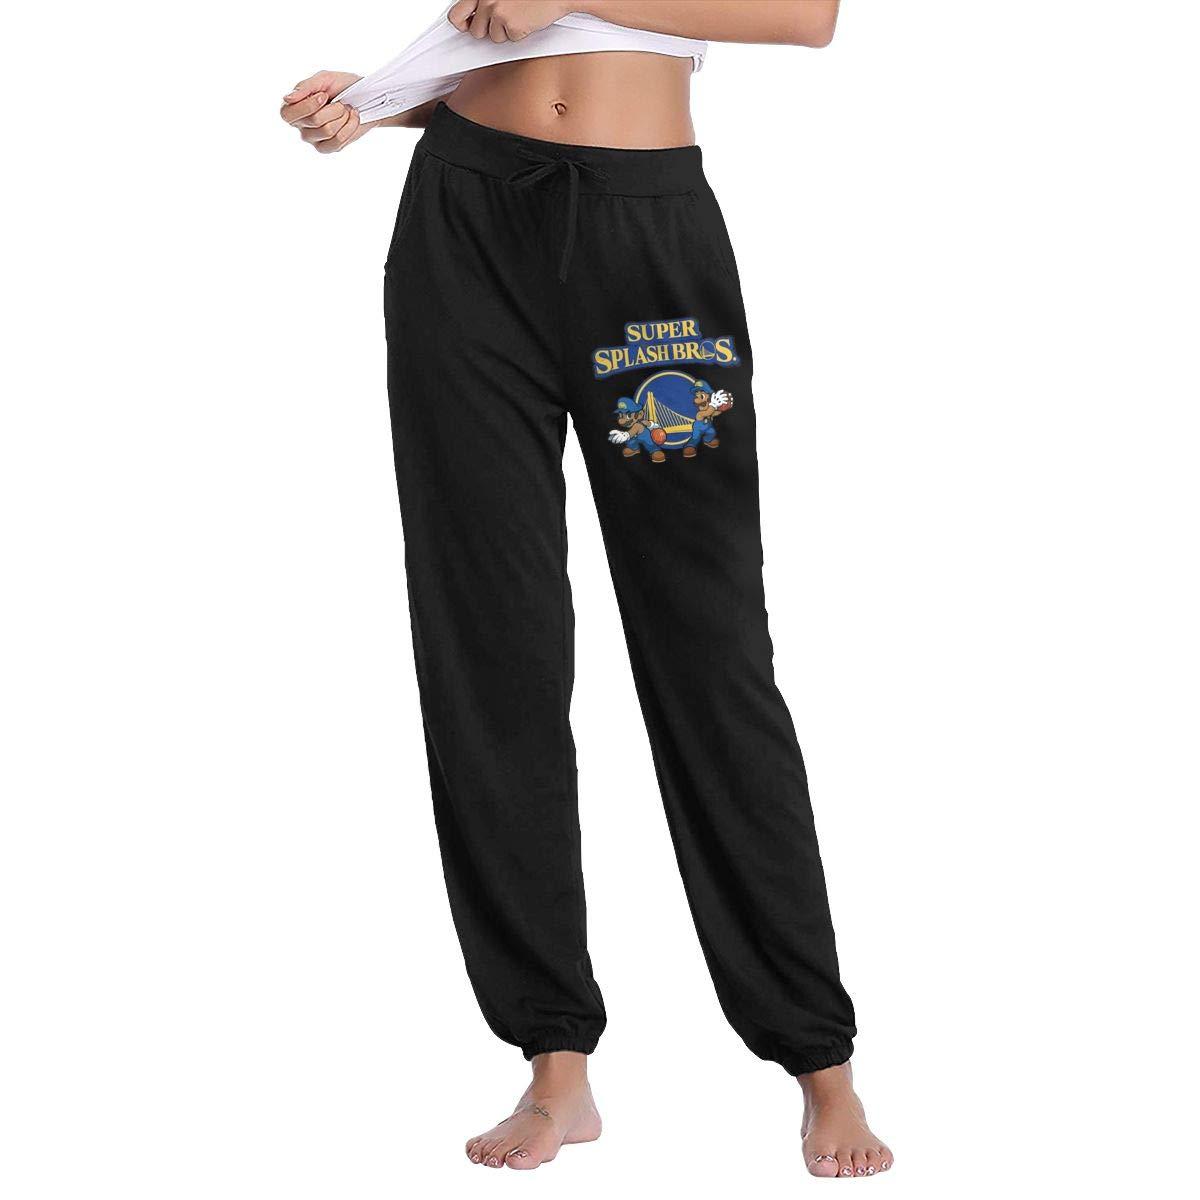 Black L GavDon Women's KlayThompsonStephenCurryWarriors Casual Sweatpants Yoga Jogger Lounge Sweat Pants with Pockets